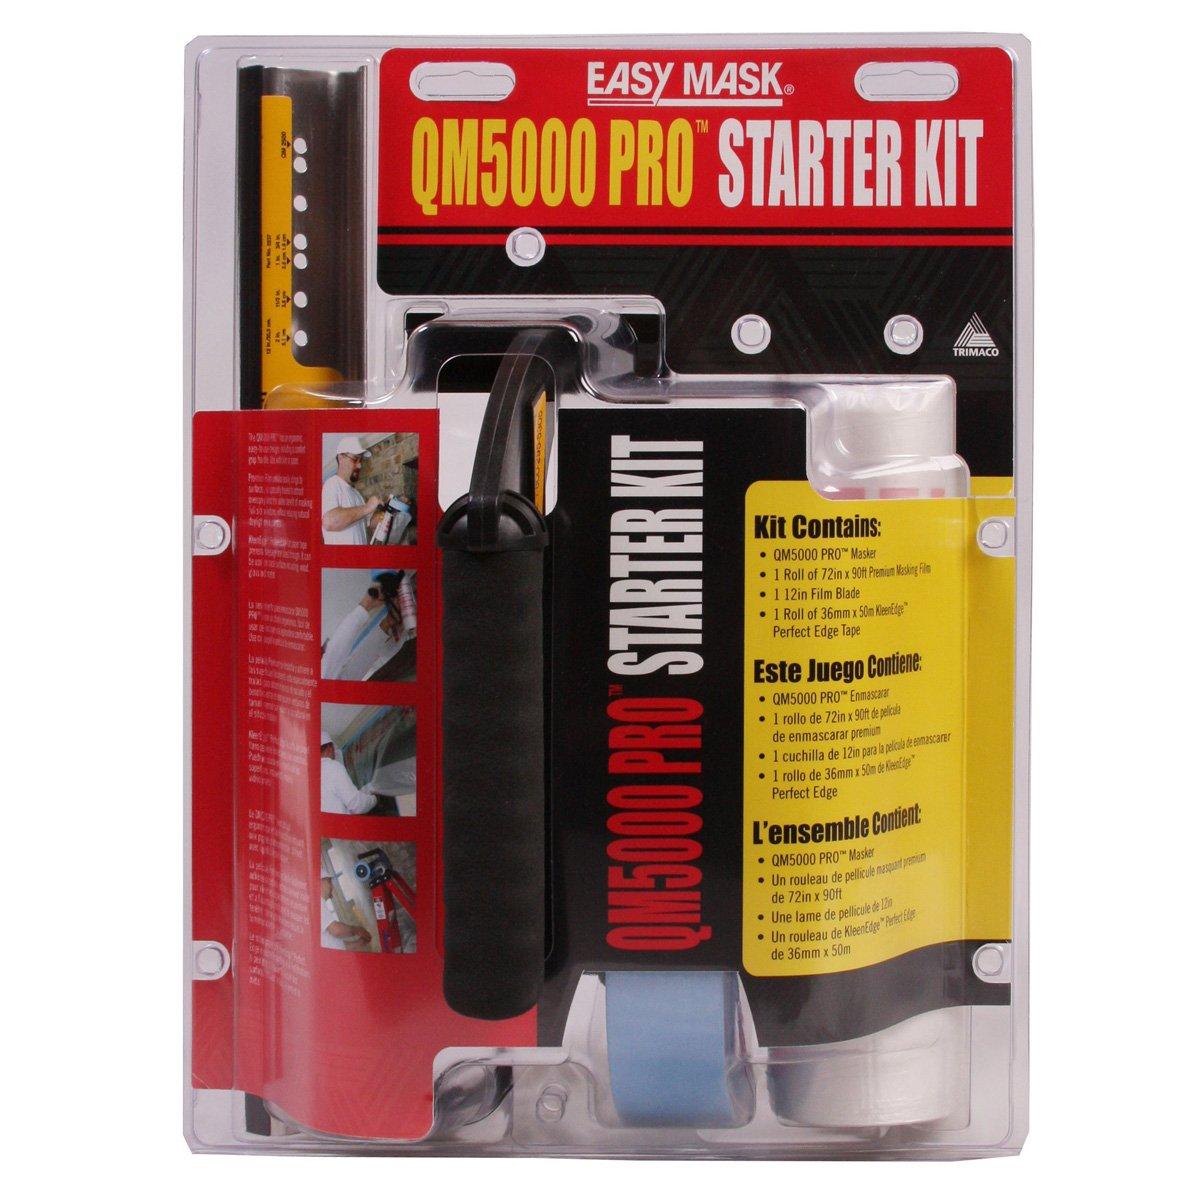 Amazon.com: Trimaco Easy Mask QM5000 Pro Starter Masking Kit: Home Improvement